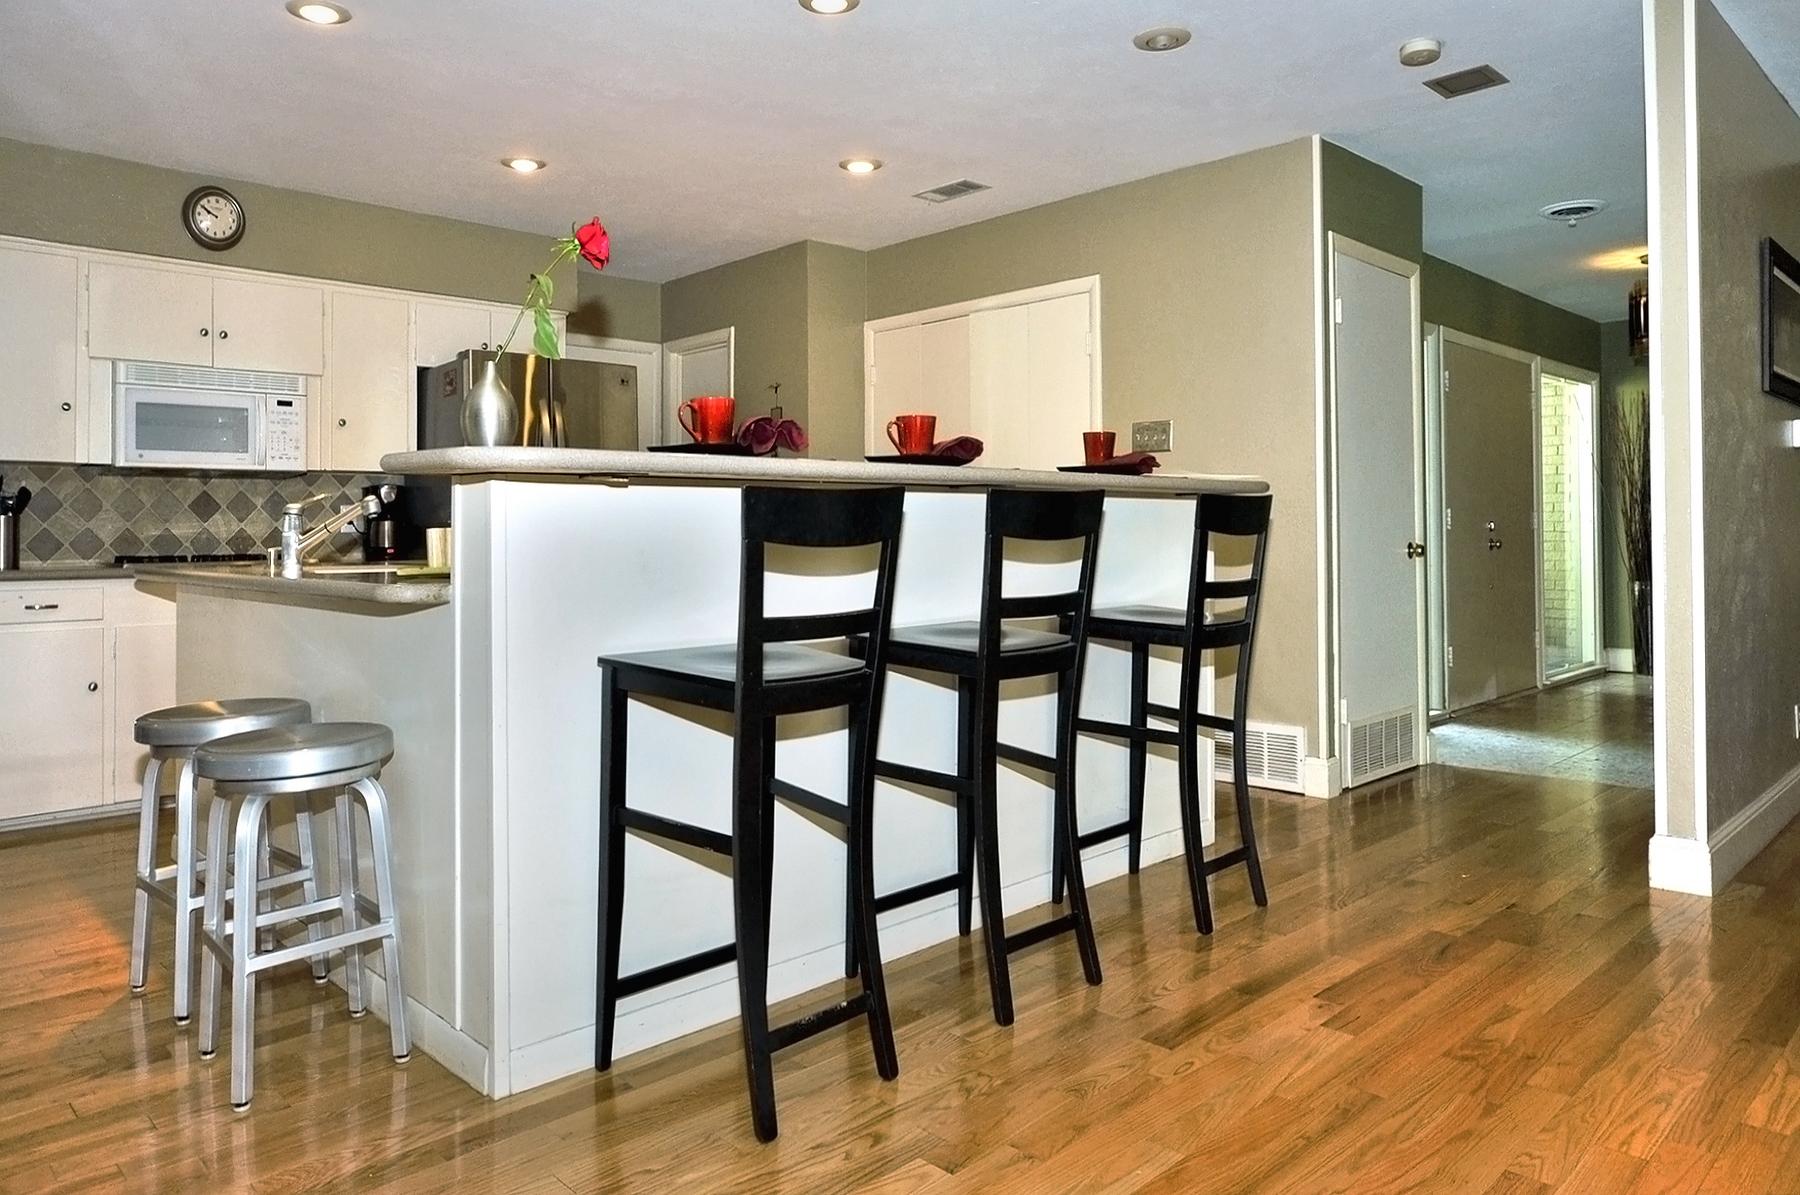 3350 Valiant Dallas Kitchen Breakfast Bar.jpg